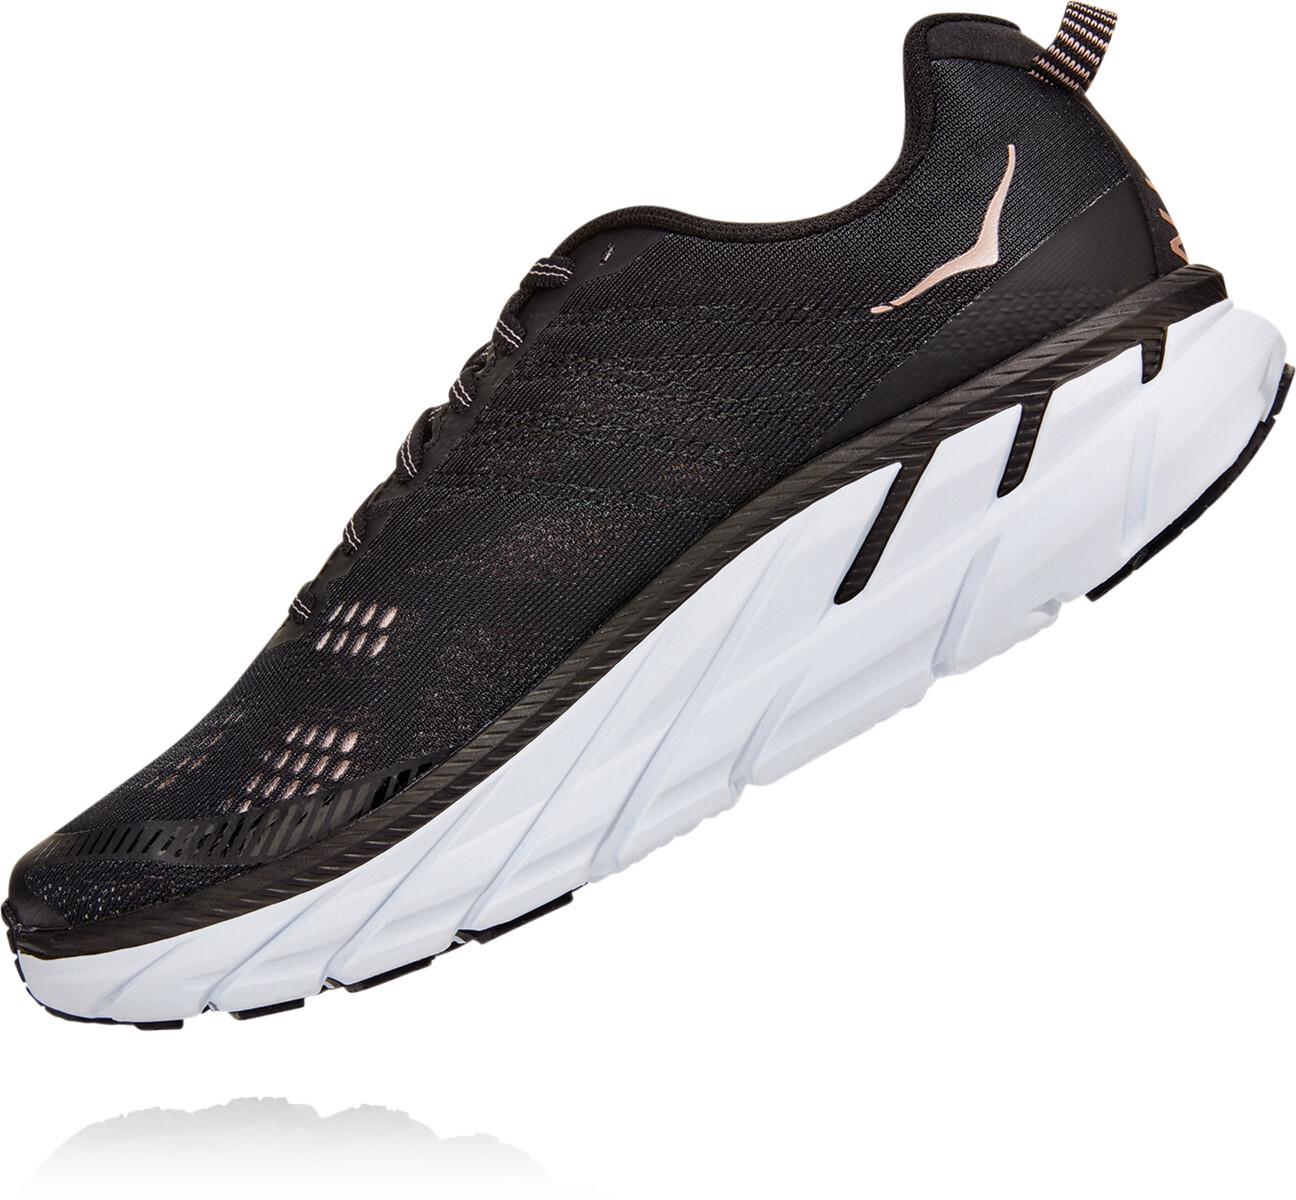 Hoka One One Clifton 6 Shoes Women blackrose gold